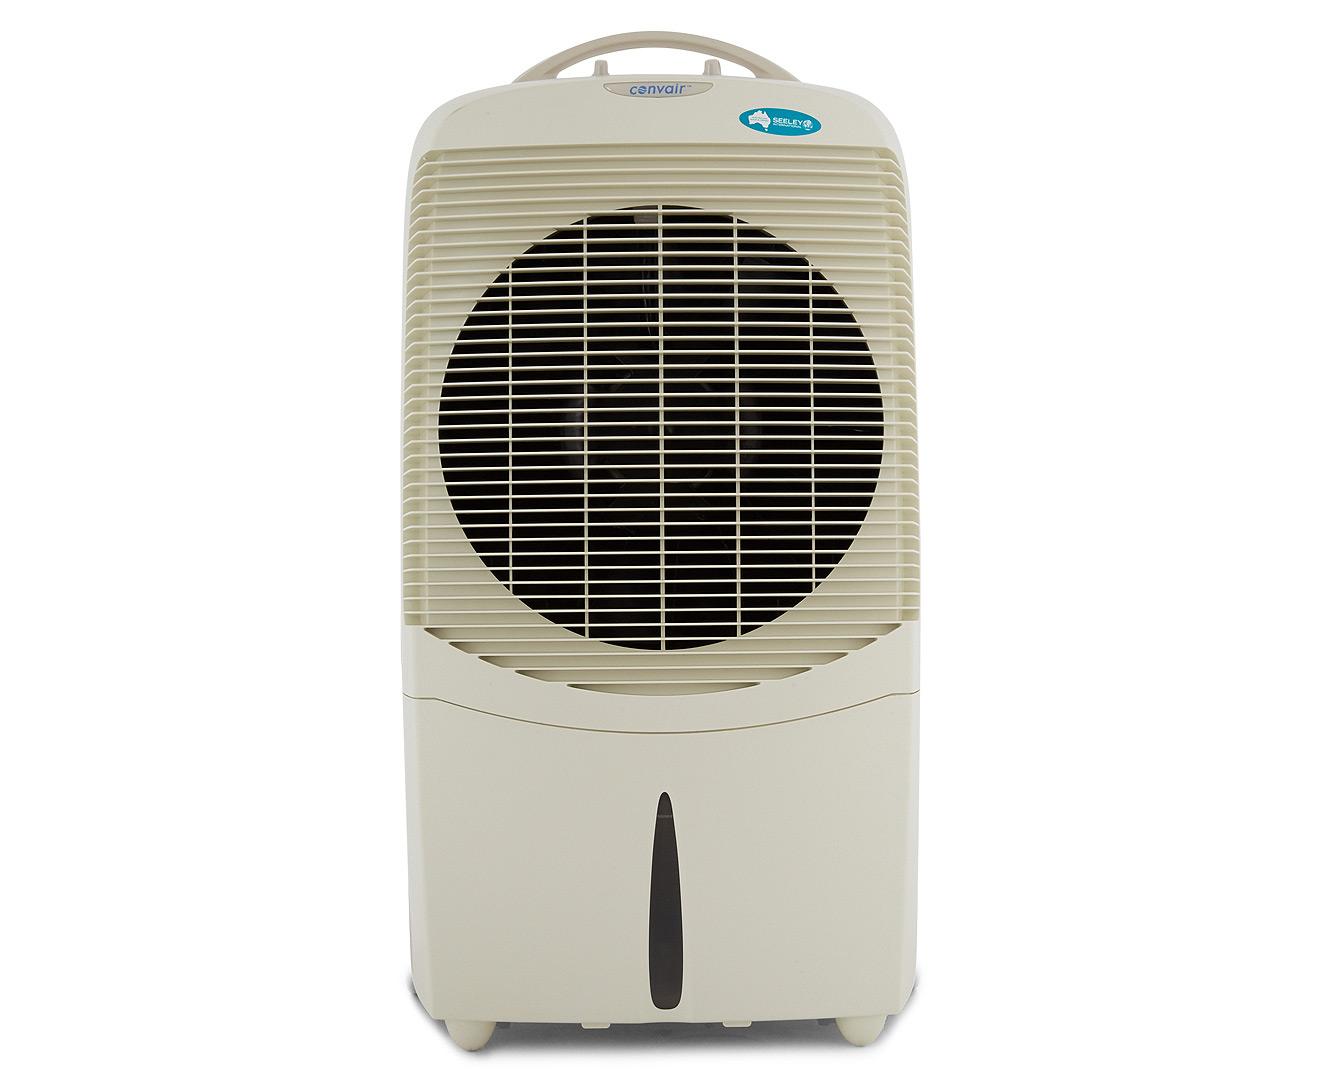 Personal Air Cooler : Convair magicool portable evaporative air cooler l